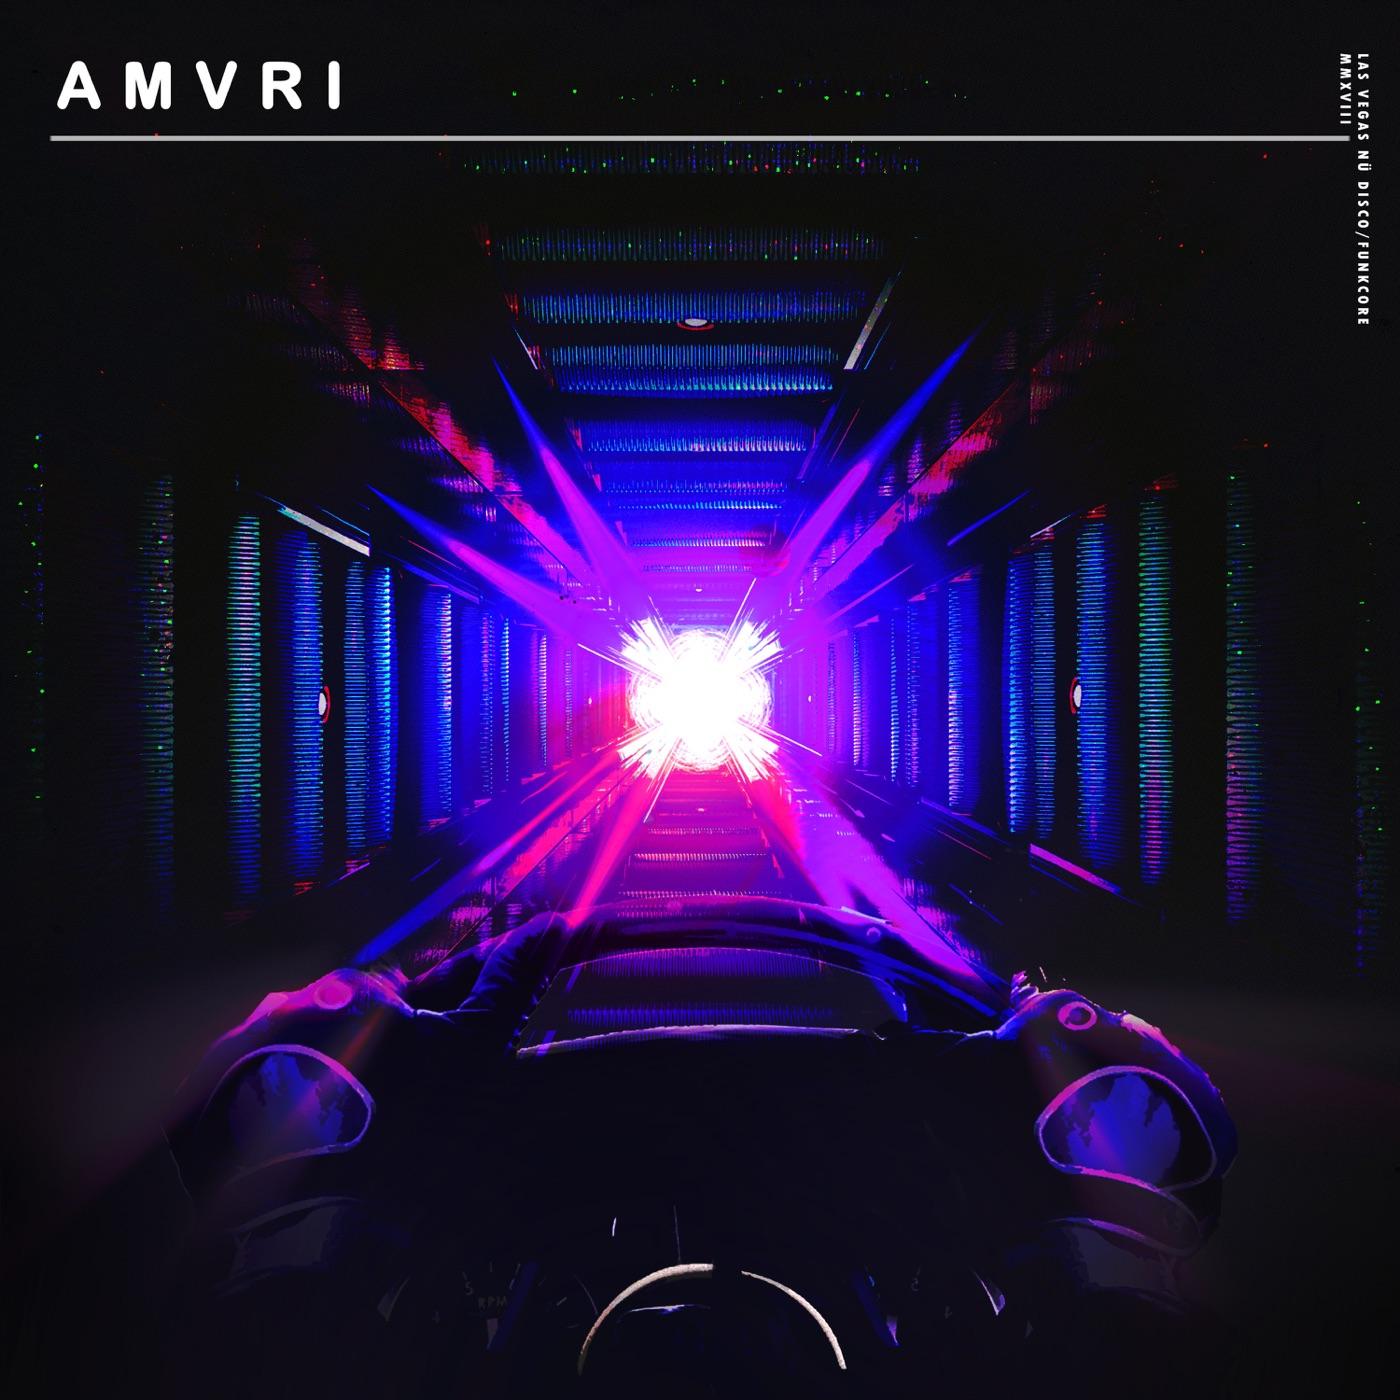 Amarionette - Amvri [EP] (2018)